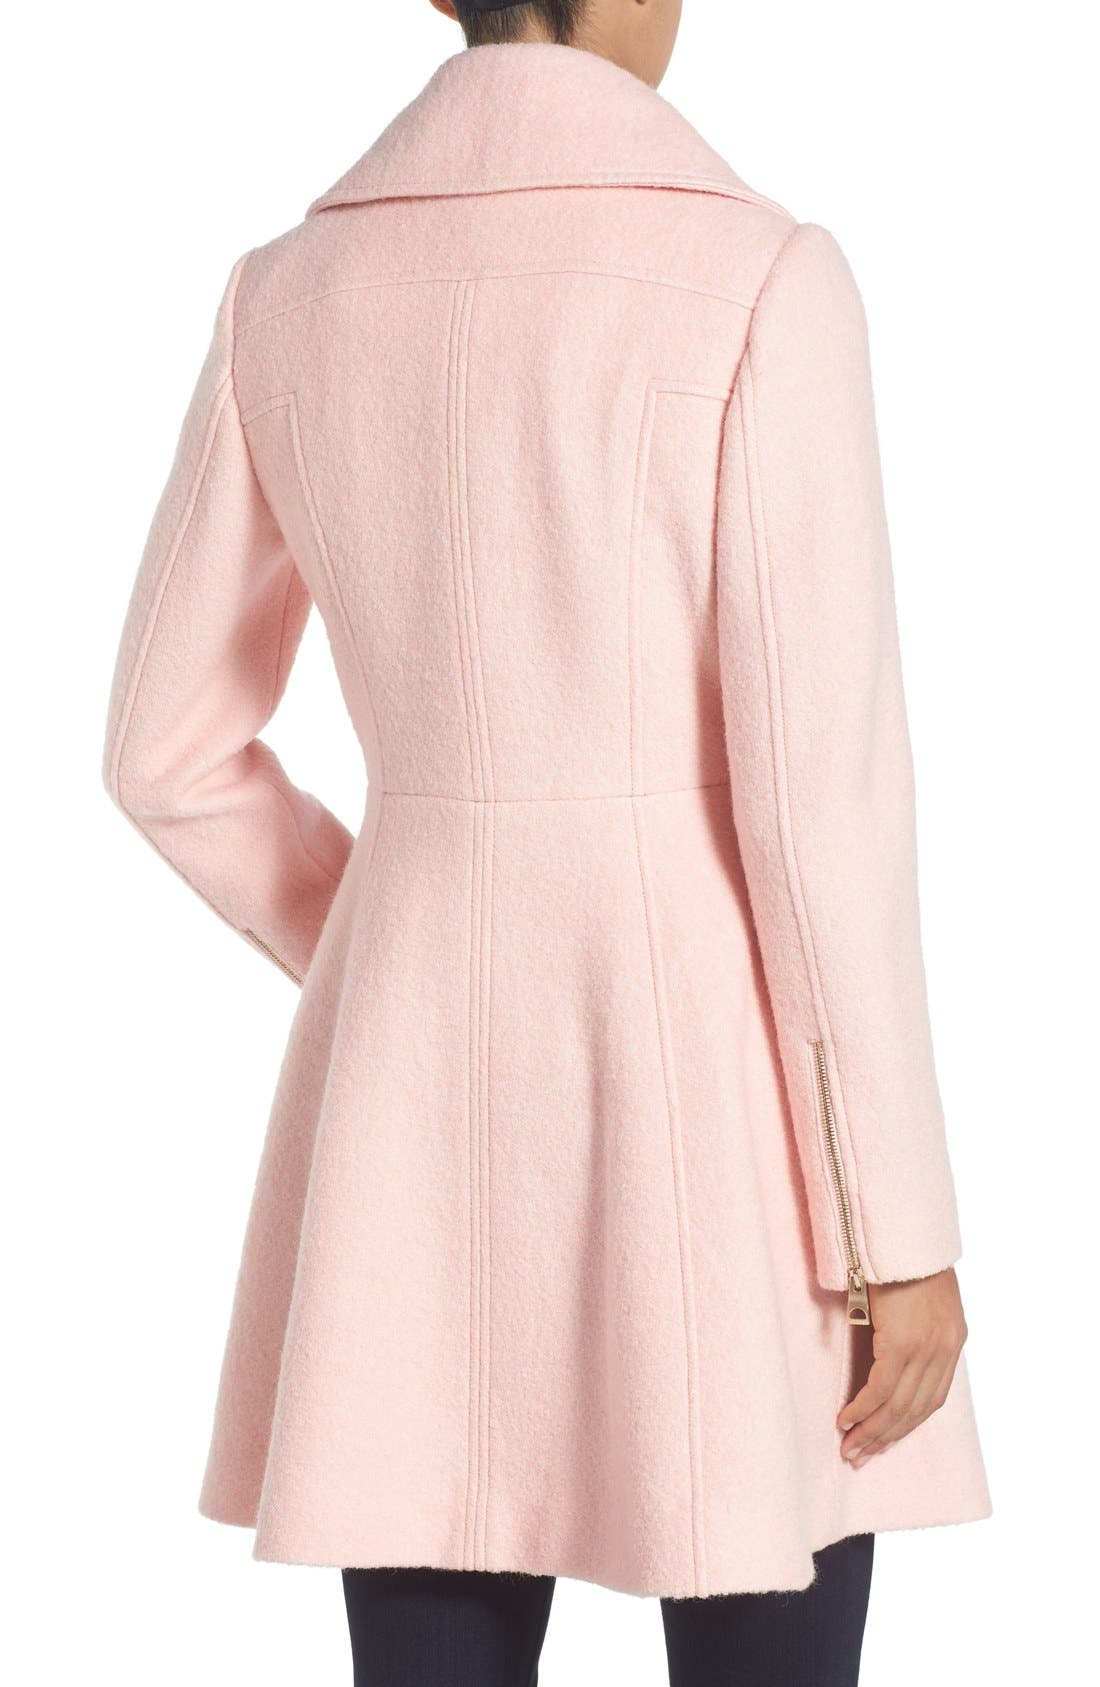 Alternate Image 3  - GUESS Envelope Collar Double Breasted Coat (Regular & Petite)